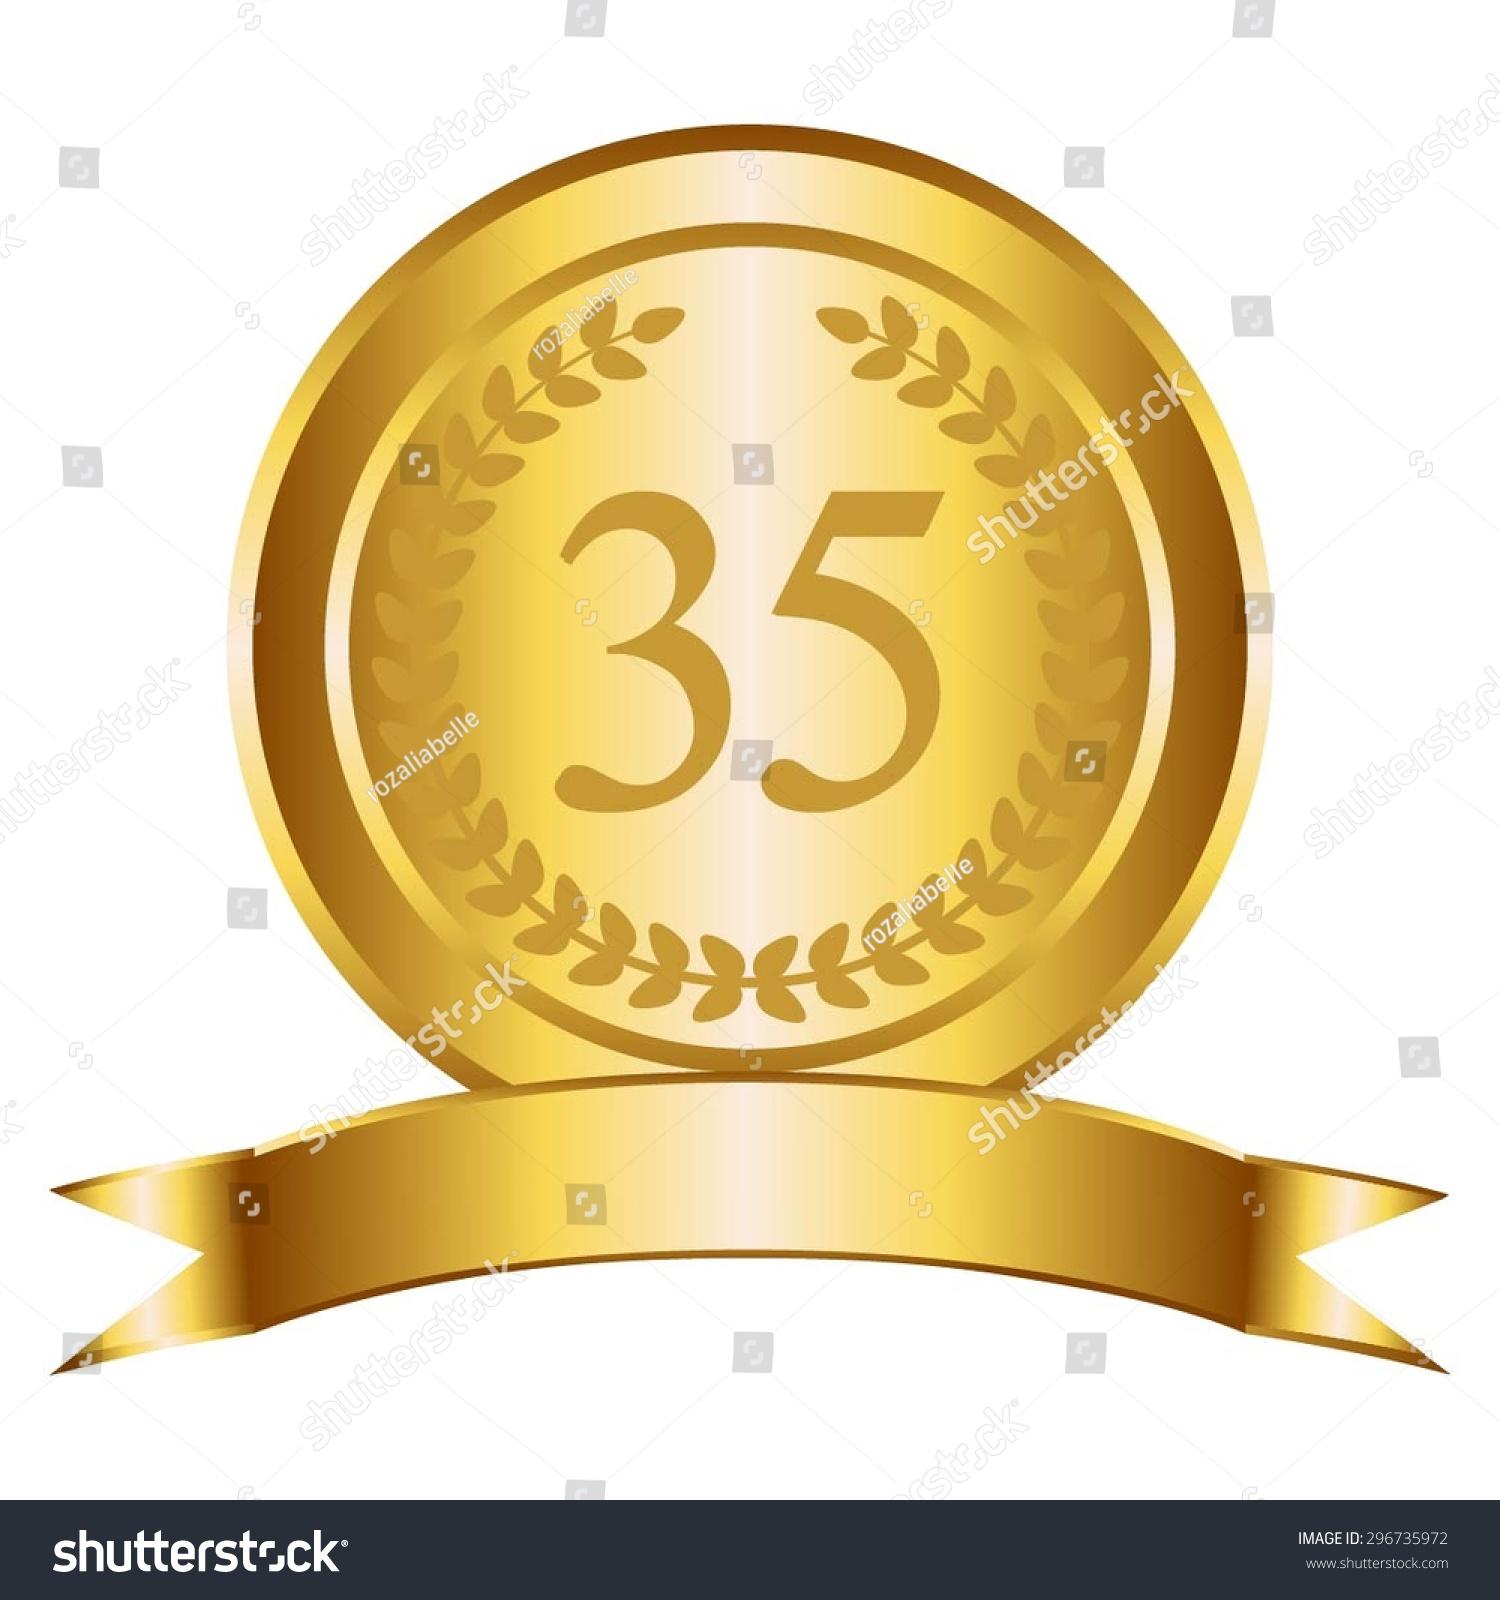 vector illustration 35 anniversary gold award stock vector royalty